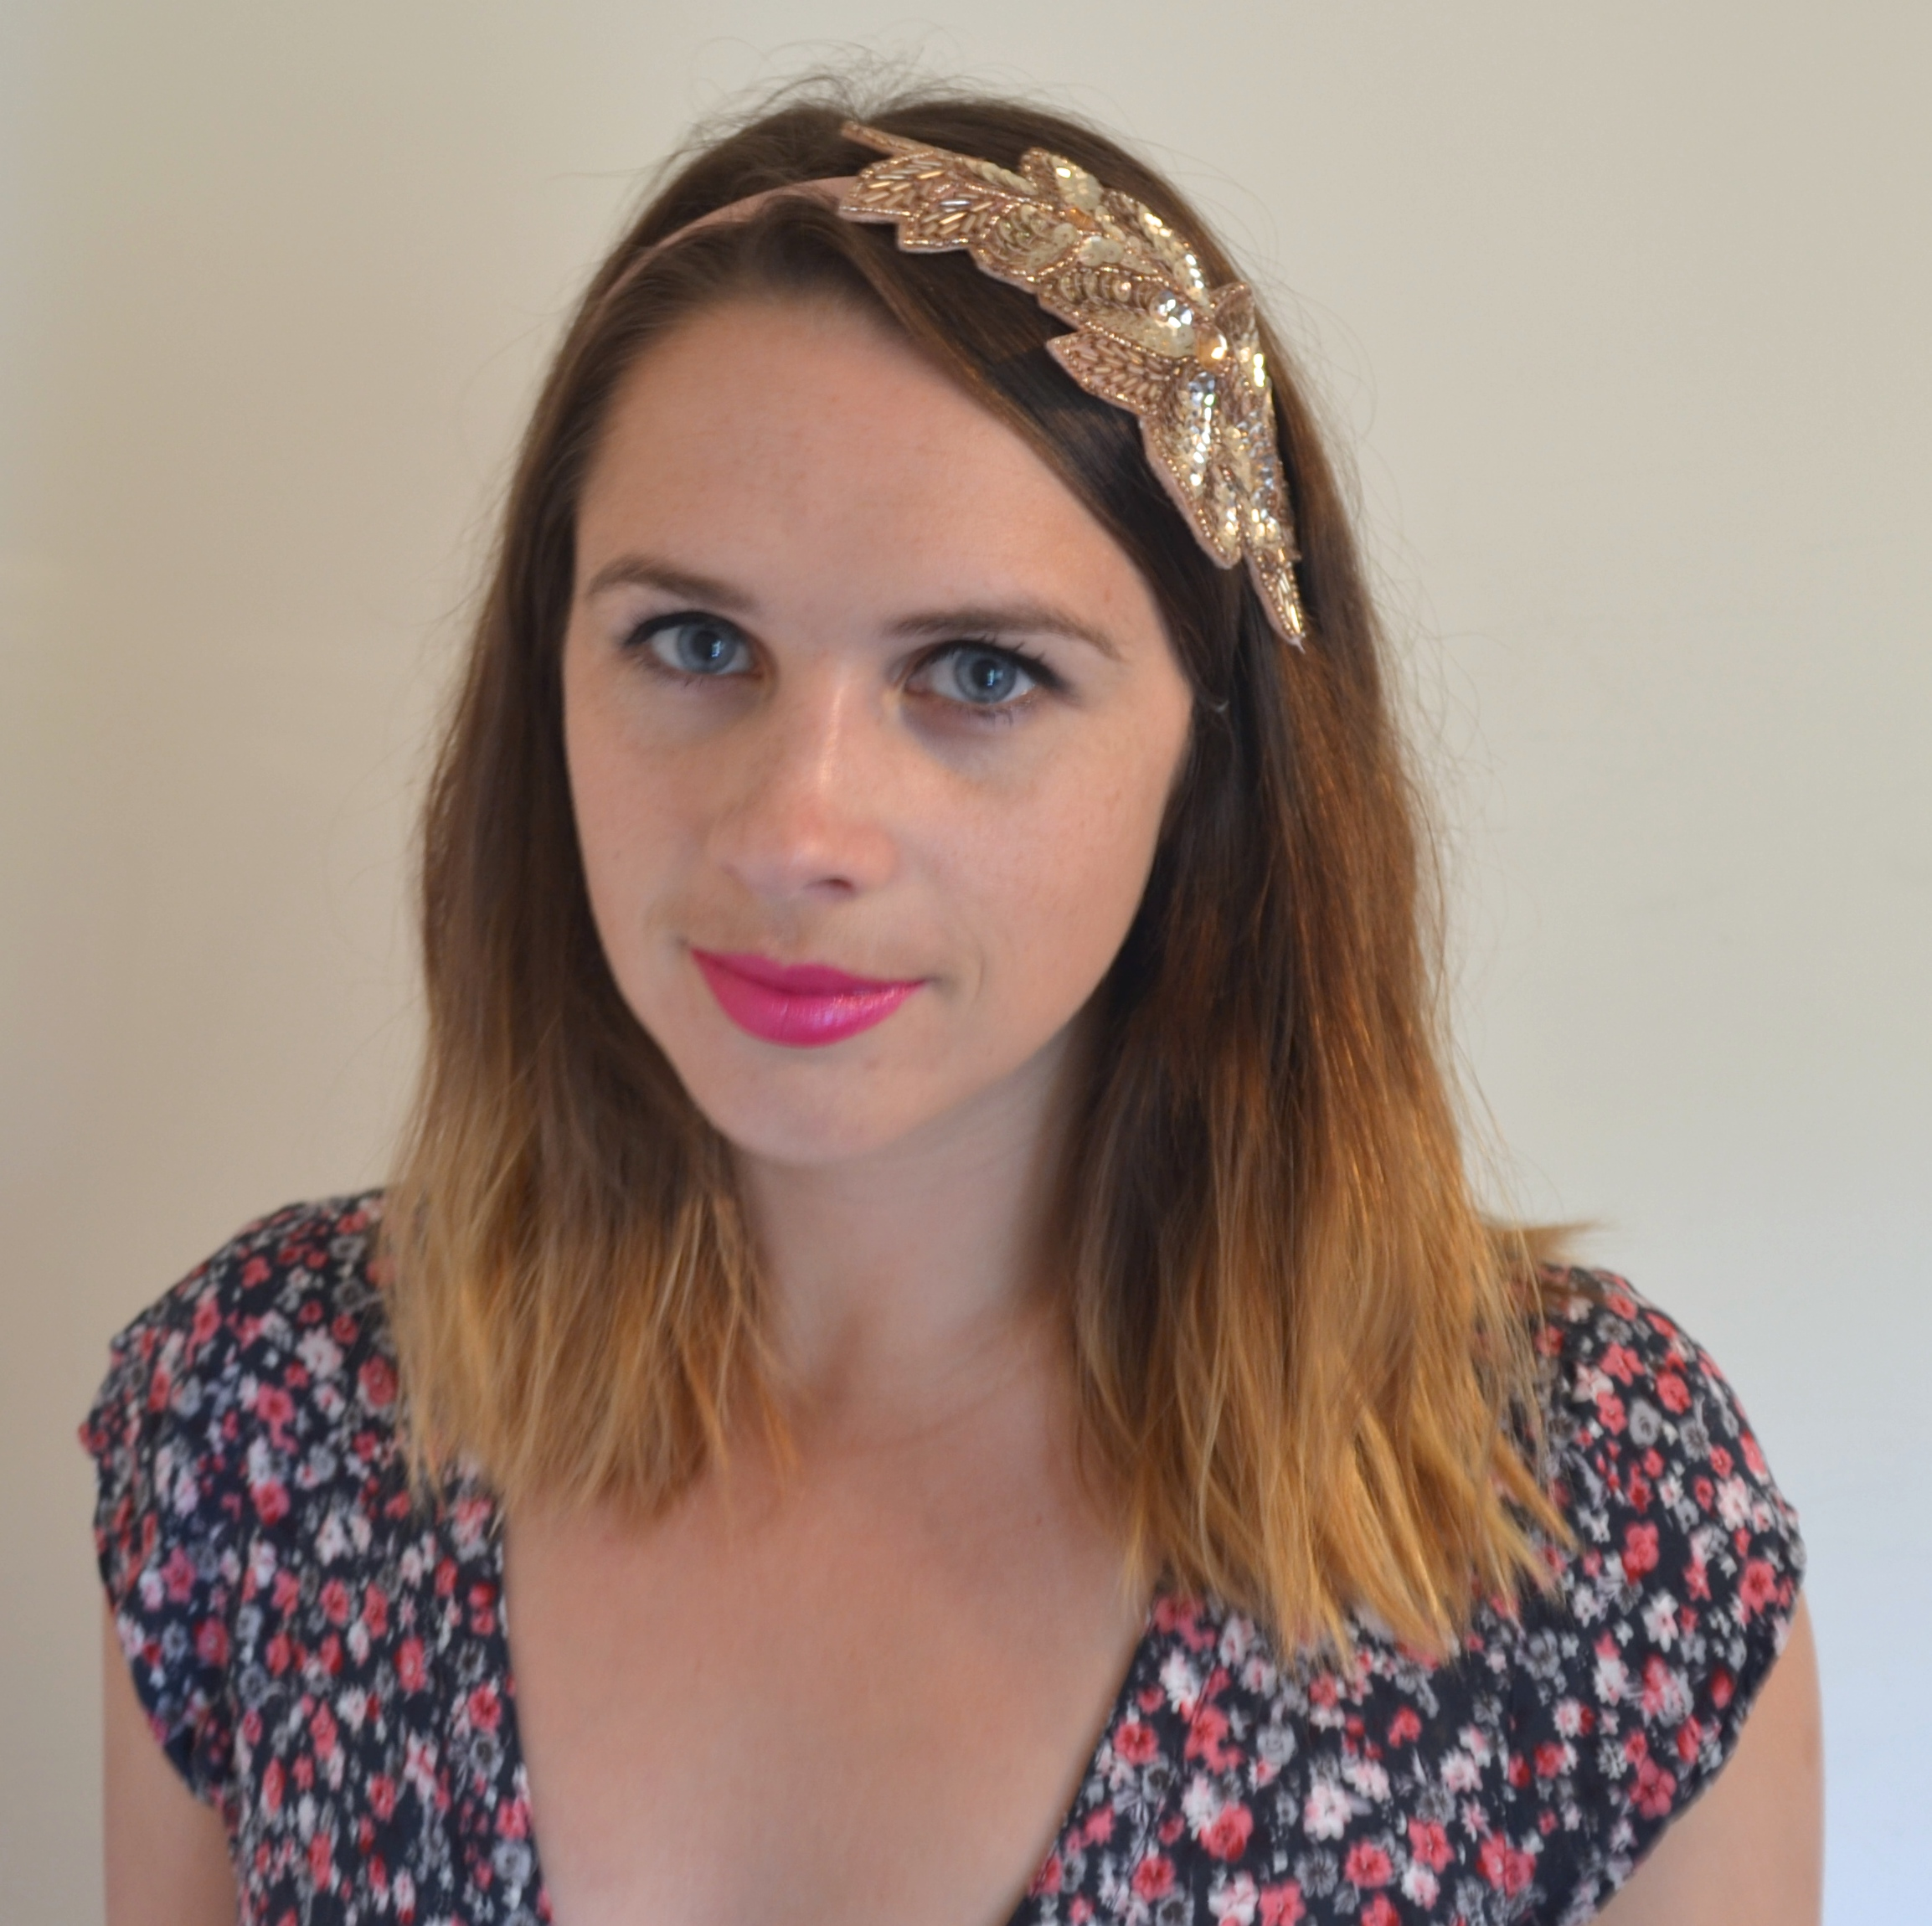 floral-headpiece-closeup-white-wall